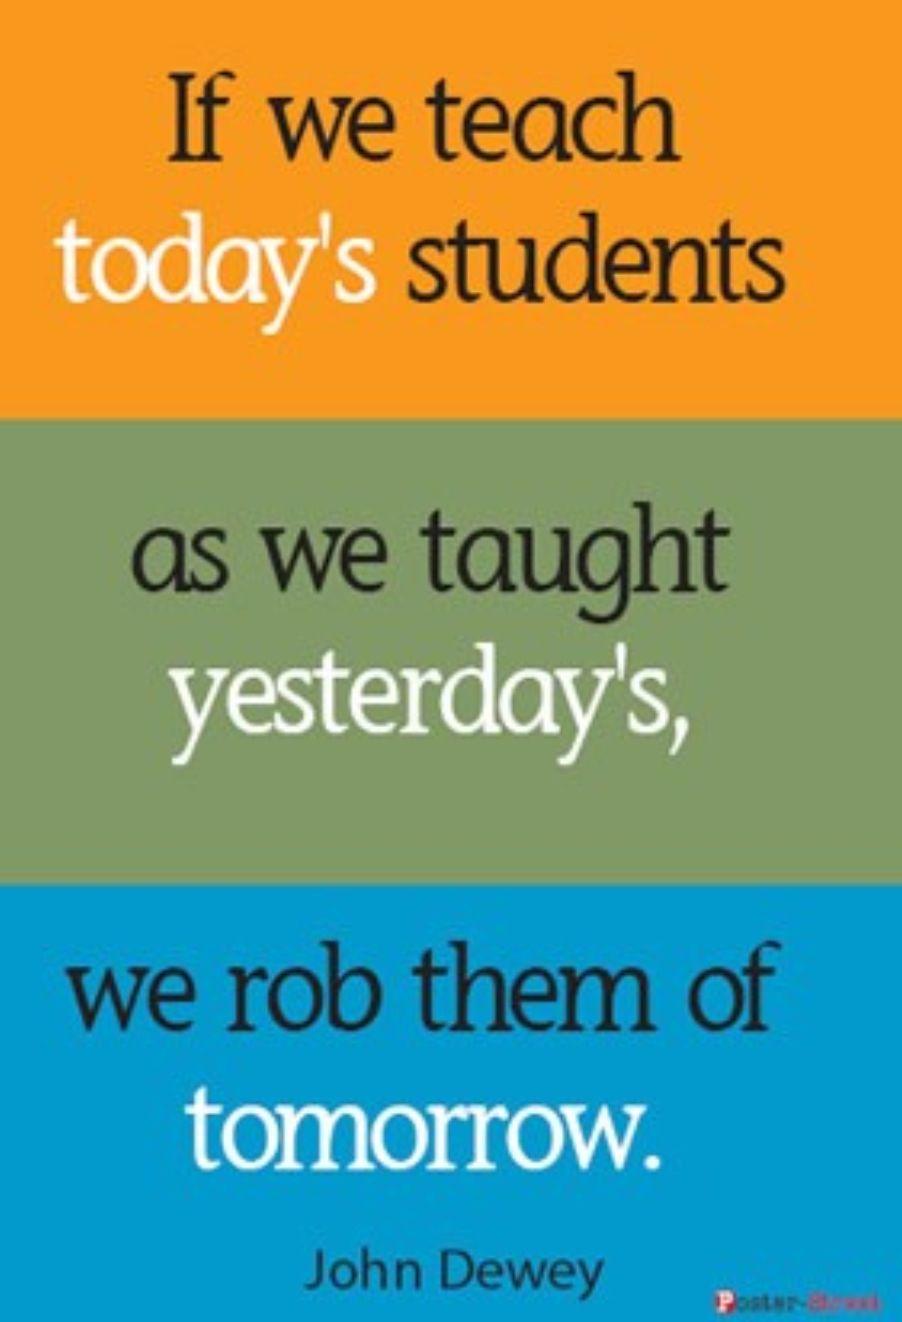 Innovative Classroom Quotes ~ Inspirational teacher quotes quotesgram